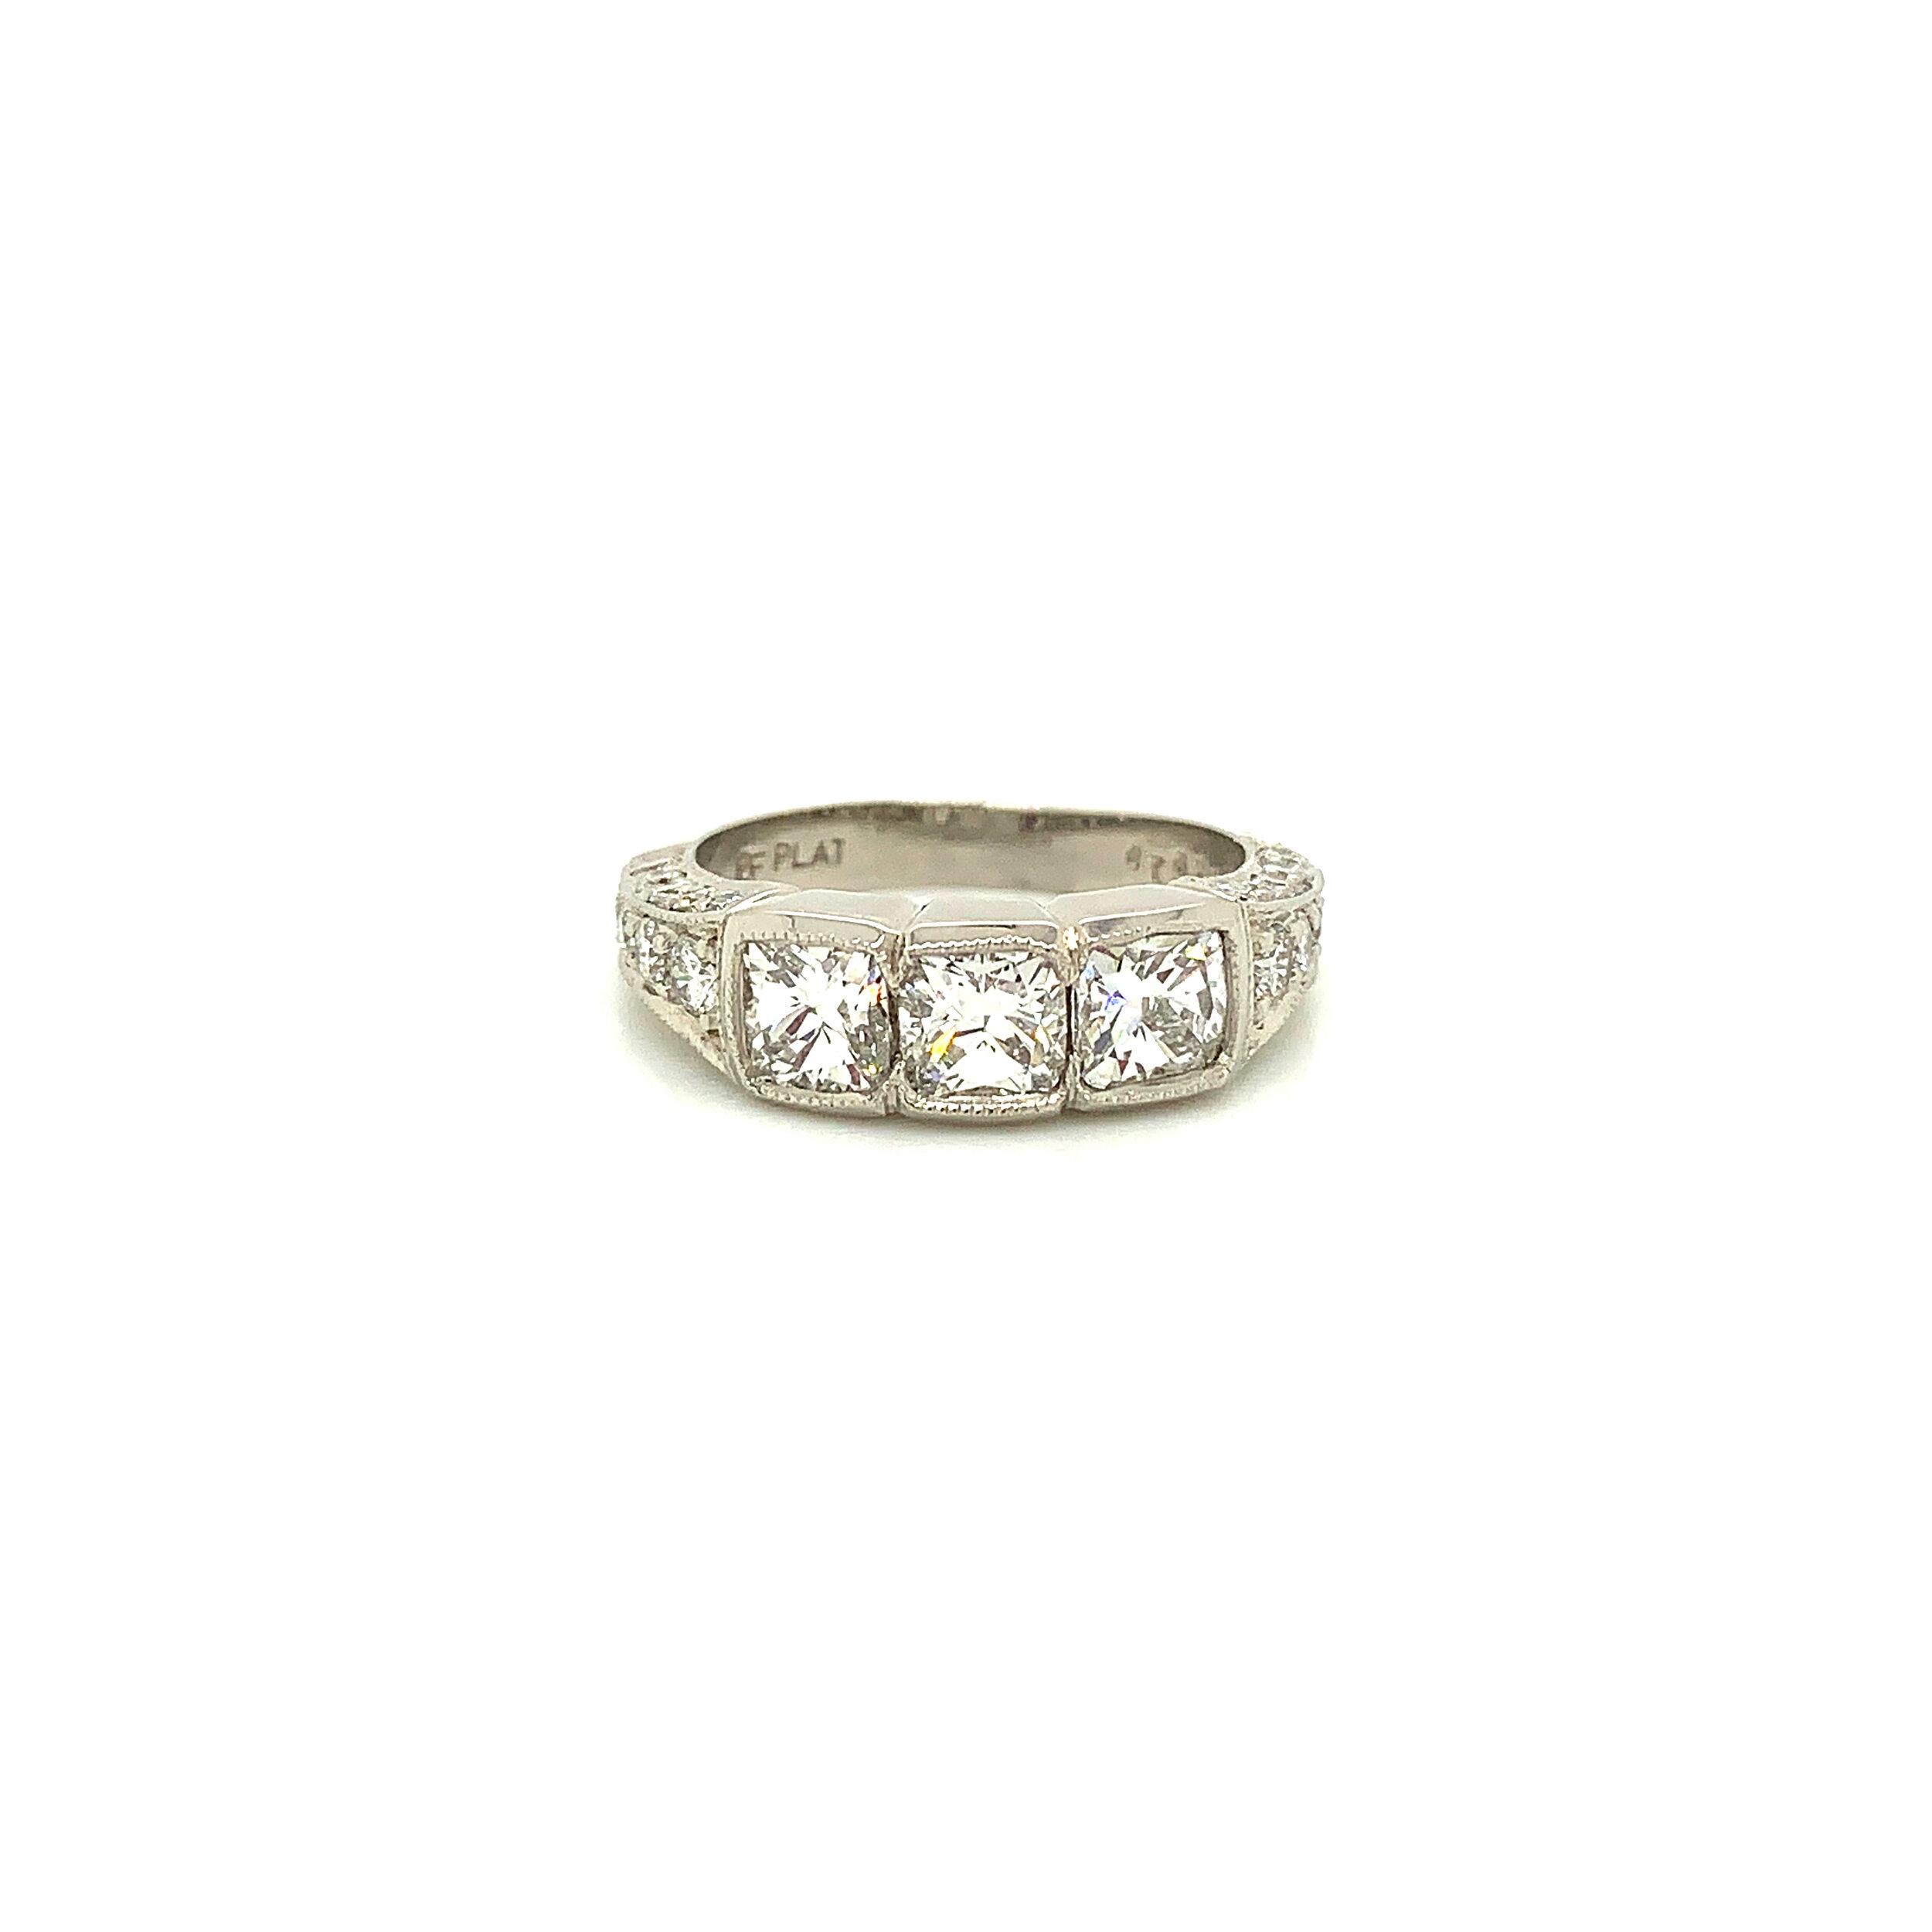 Vintage 2.20ct Diamond Band Ring Set in Platinum, Martin Flyer  Est. US$ 5,000-7,000